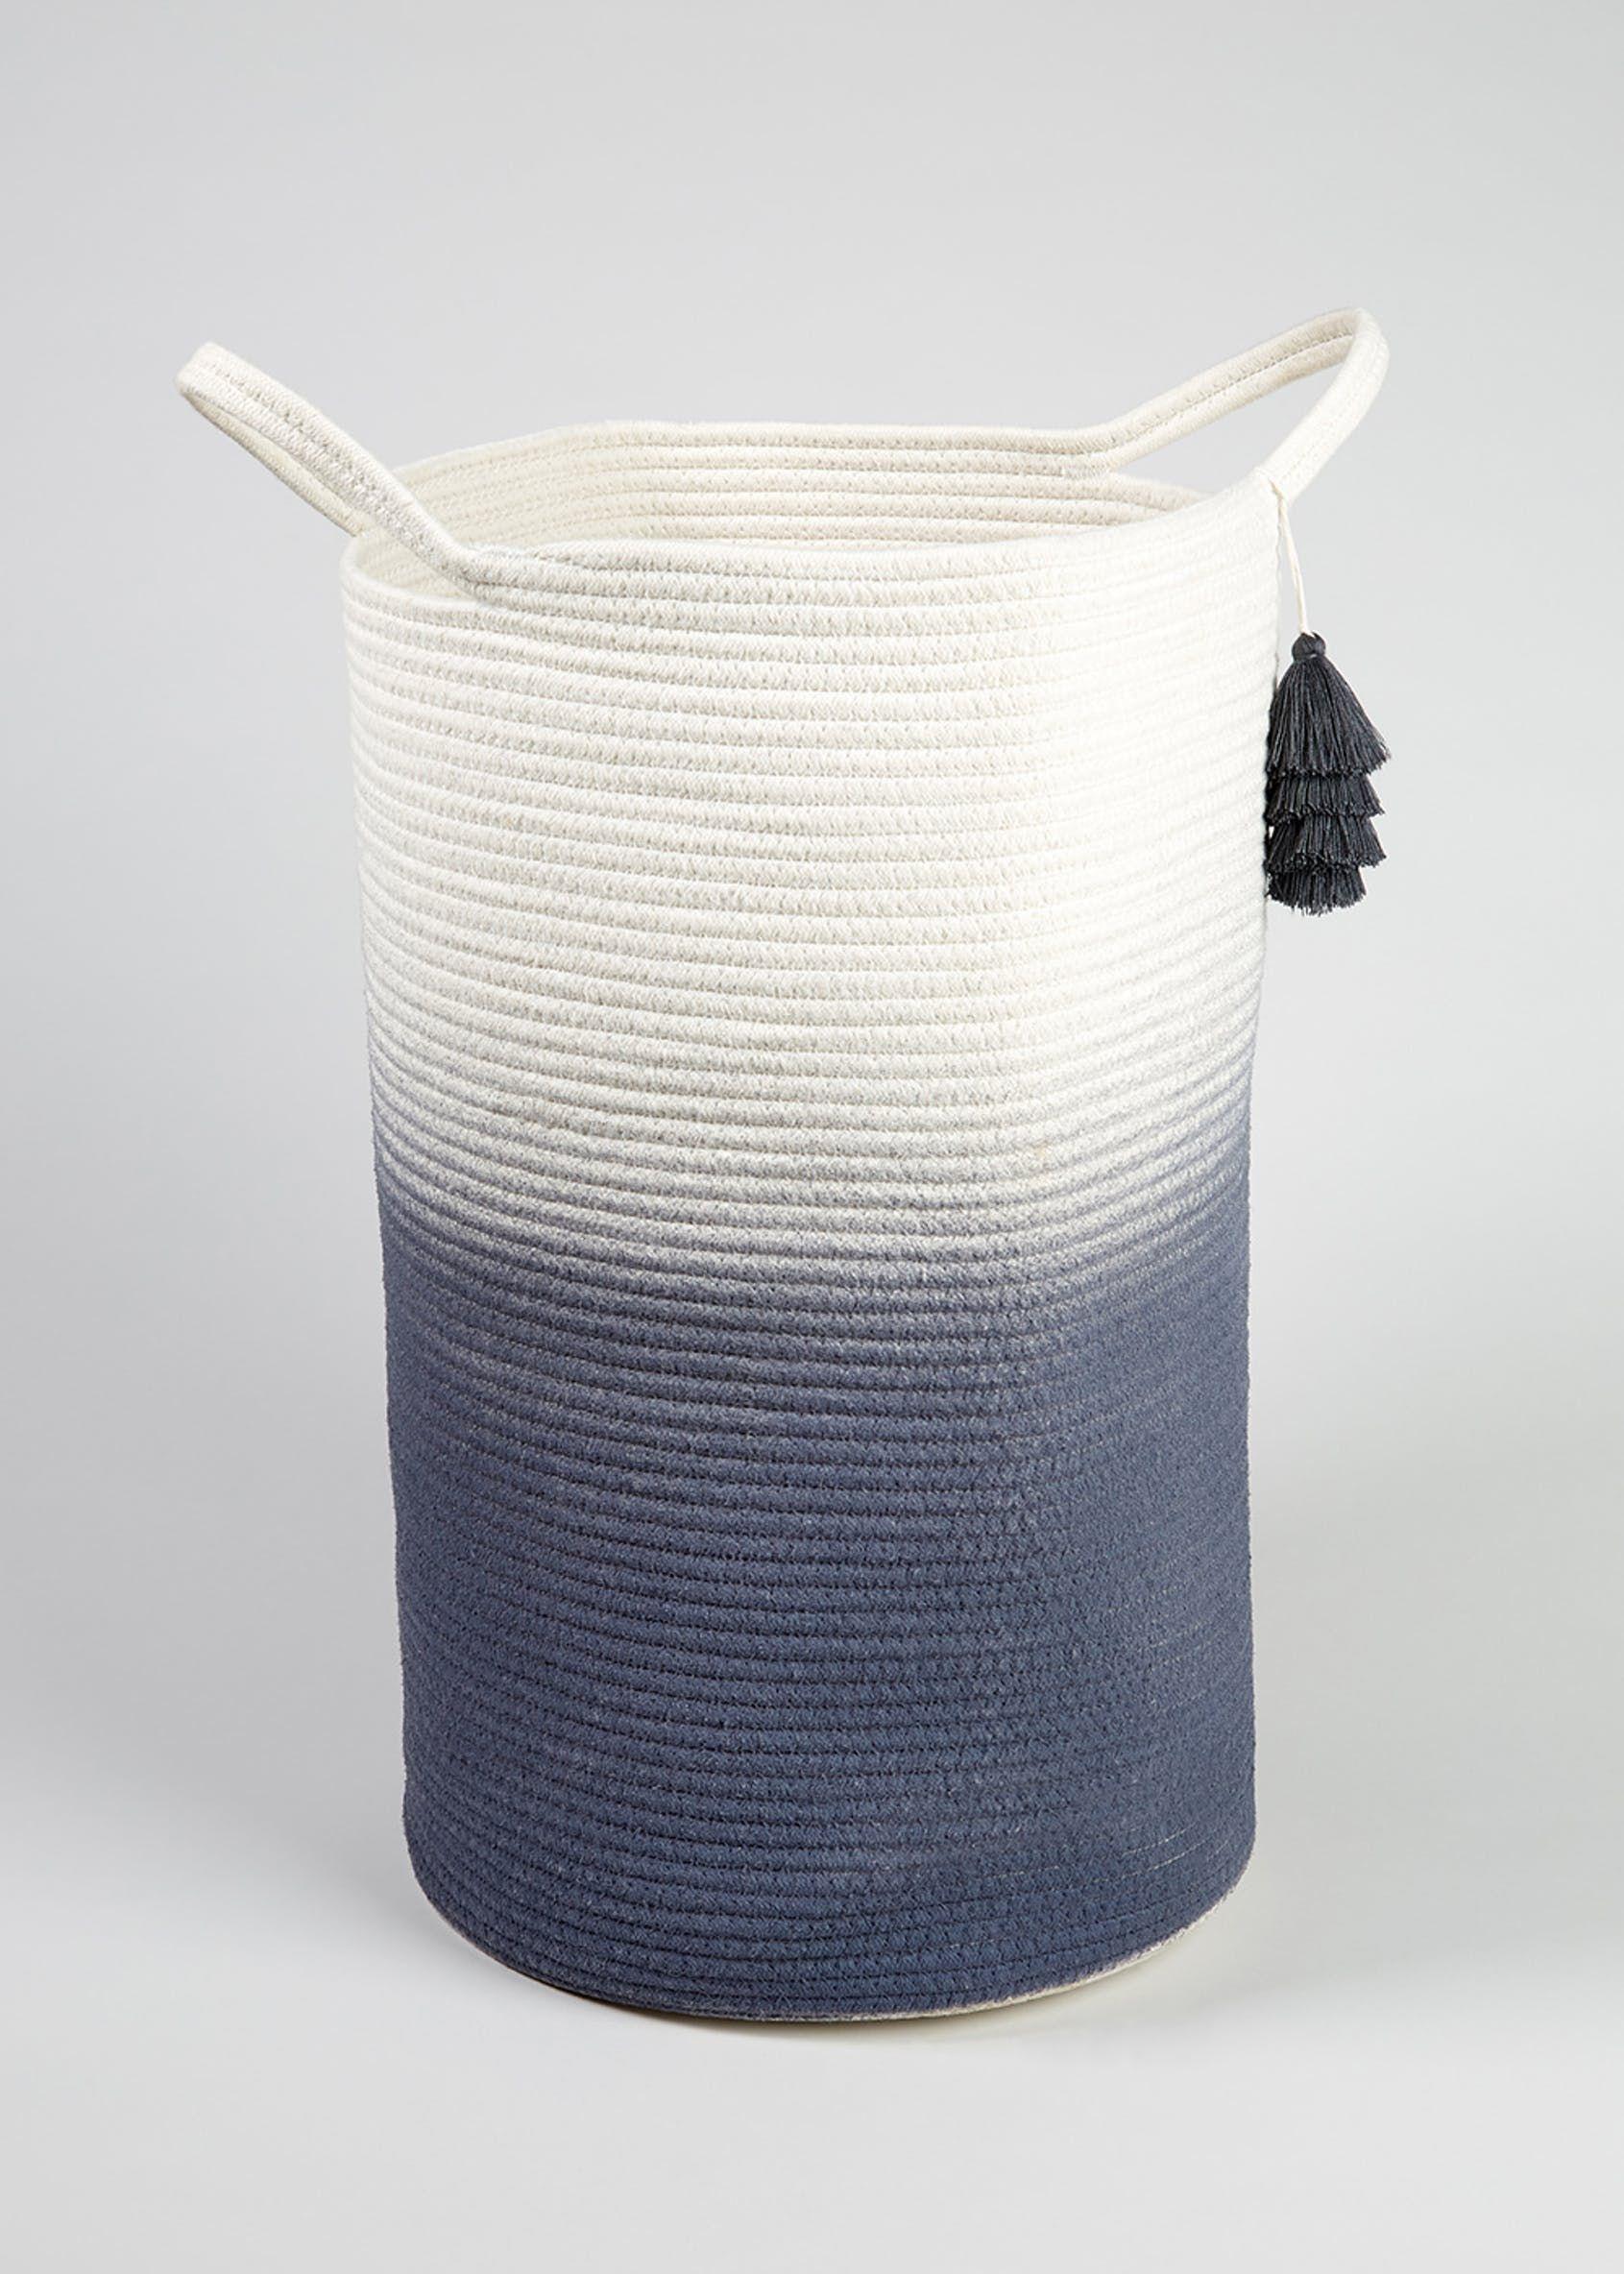 Ombre Rope Laundry Basket Blue Baby Laundry Basket Laundry